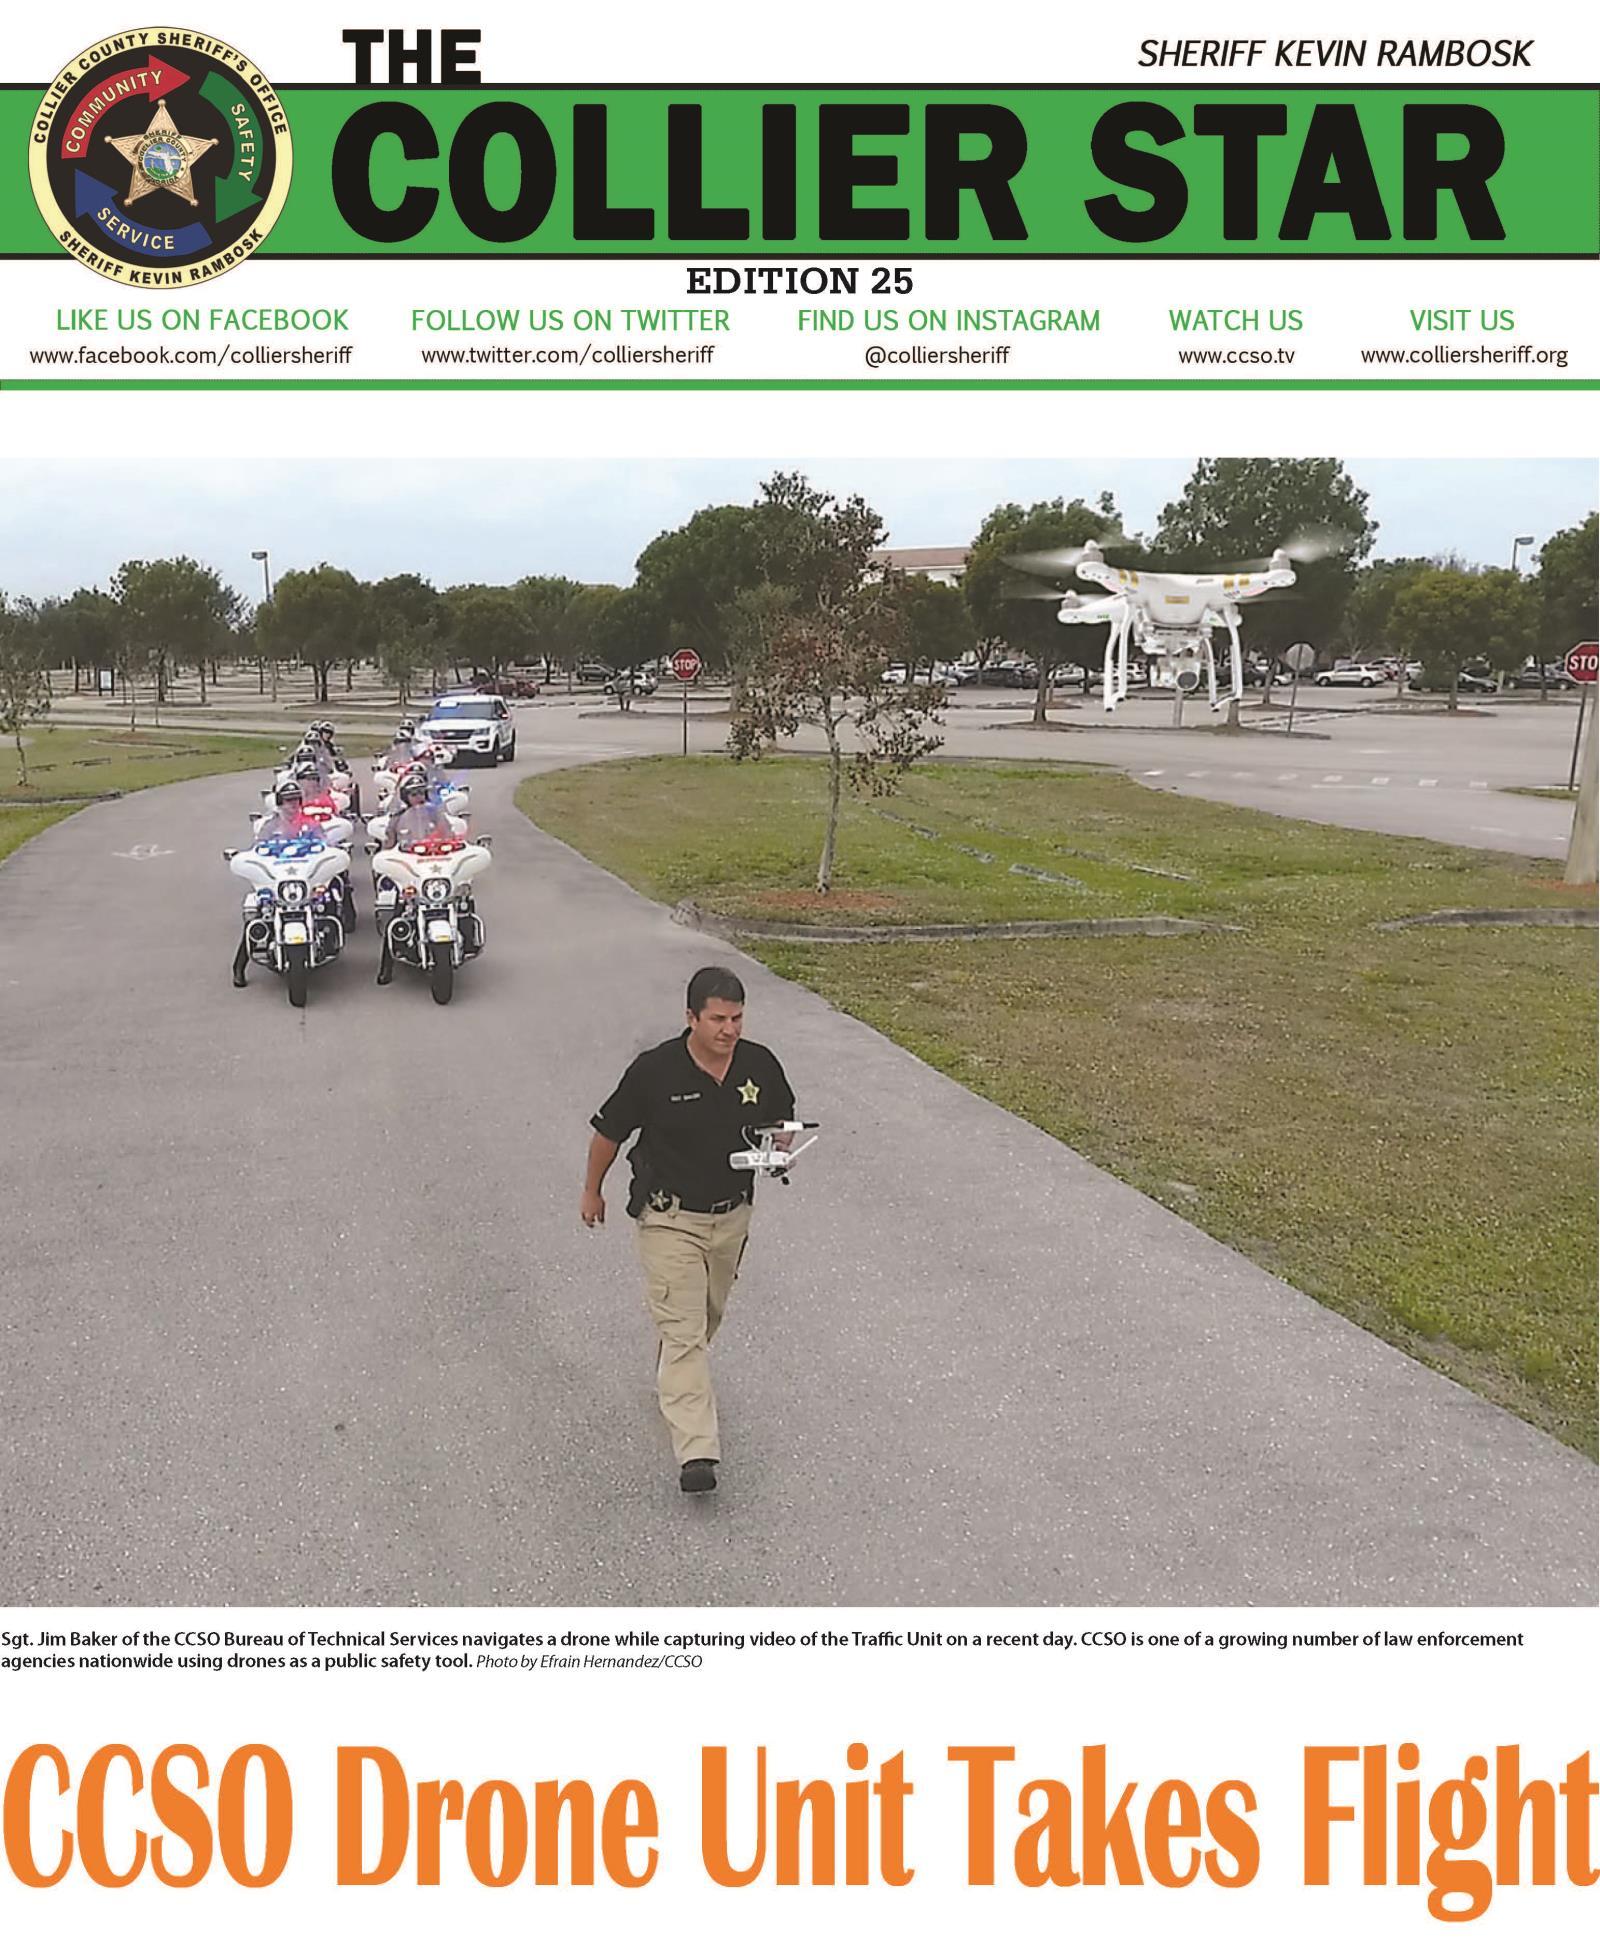 Collier Star Edition 25 Drone Unit Photo